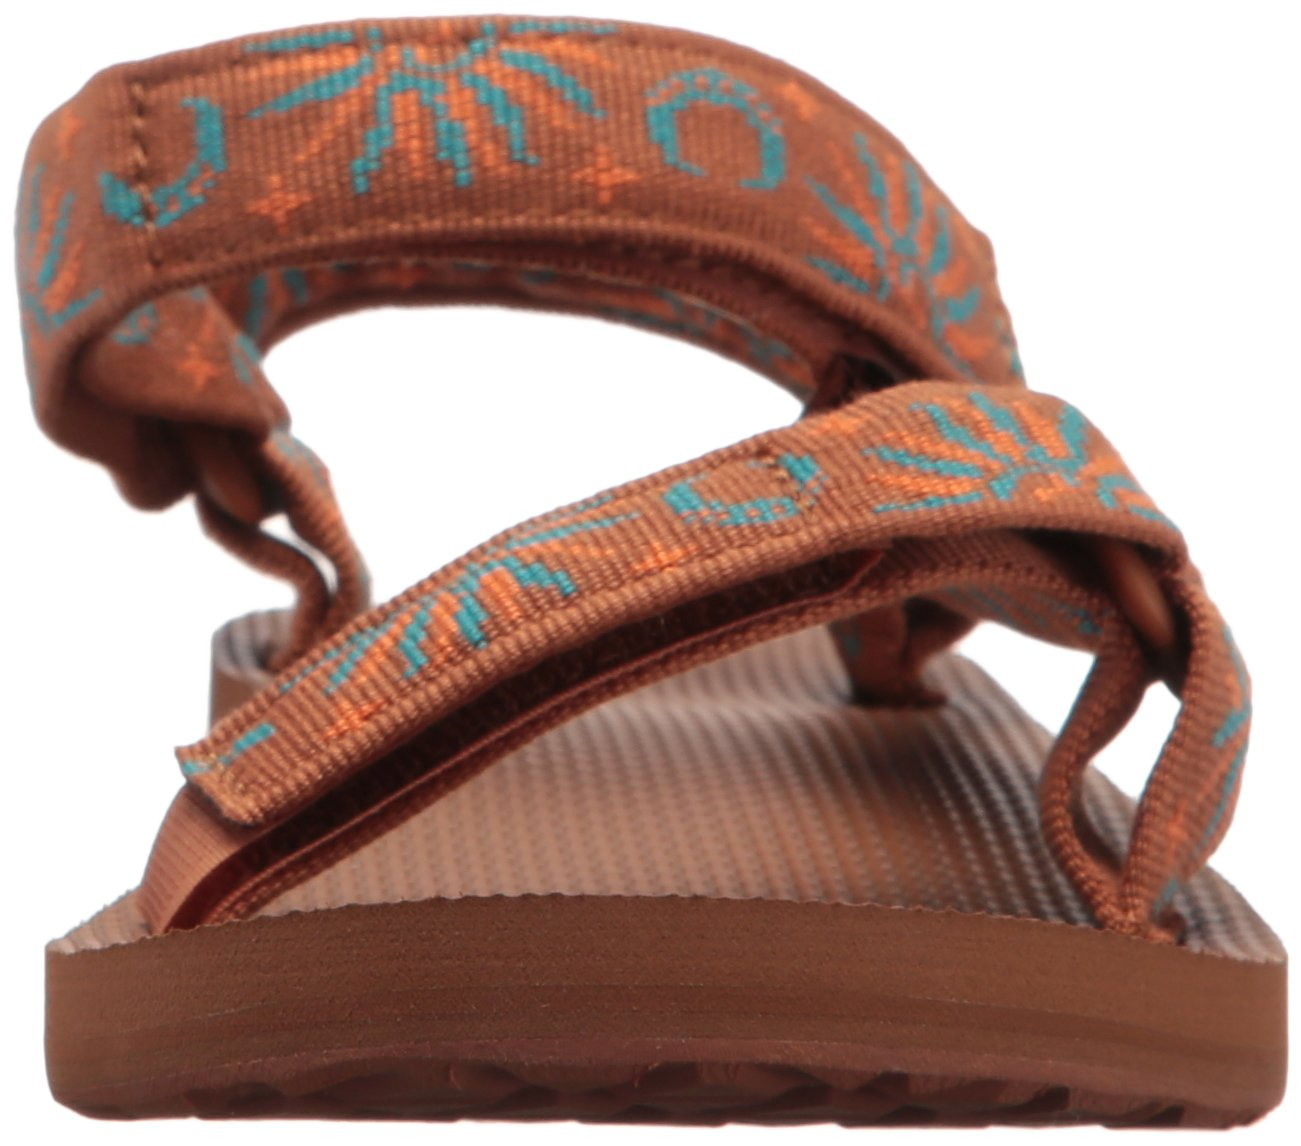 Teva Womens Women's W Original 7 Universal Sport Sandal B071G3J3HS 7 Original B(M) US|Sun/Moon Caramel 6a7851